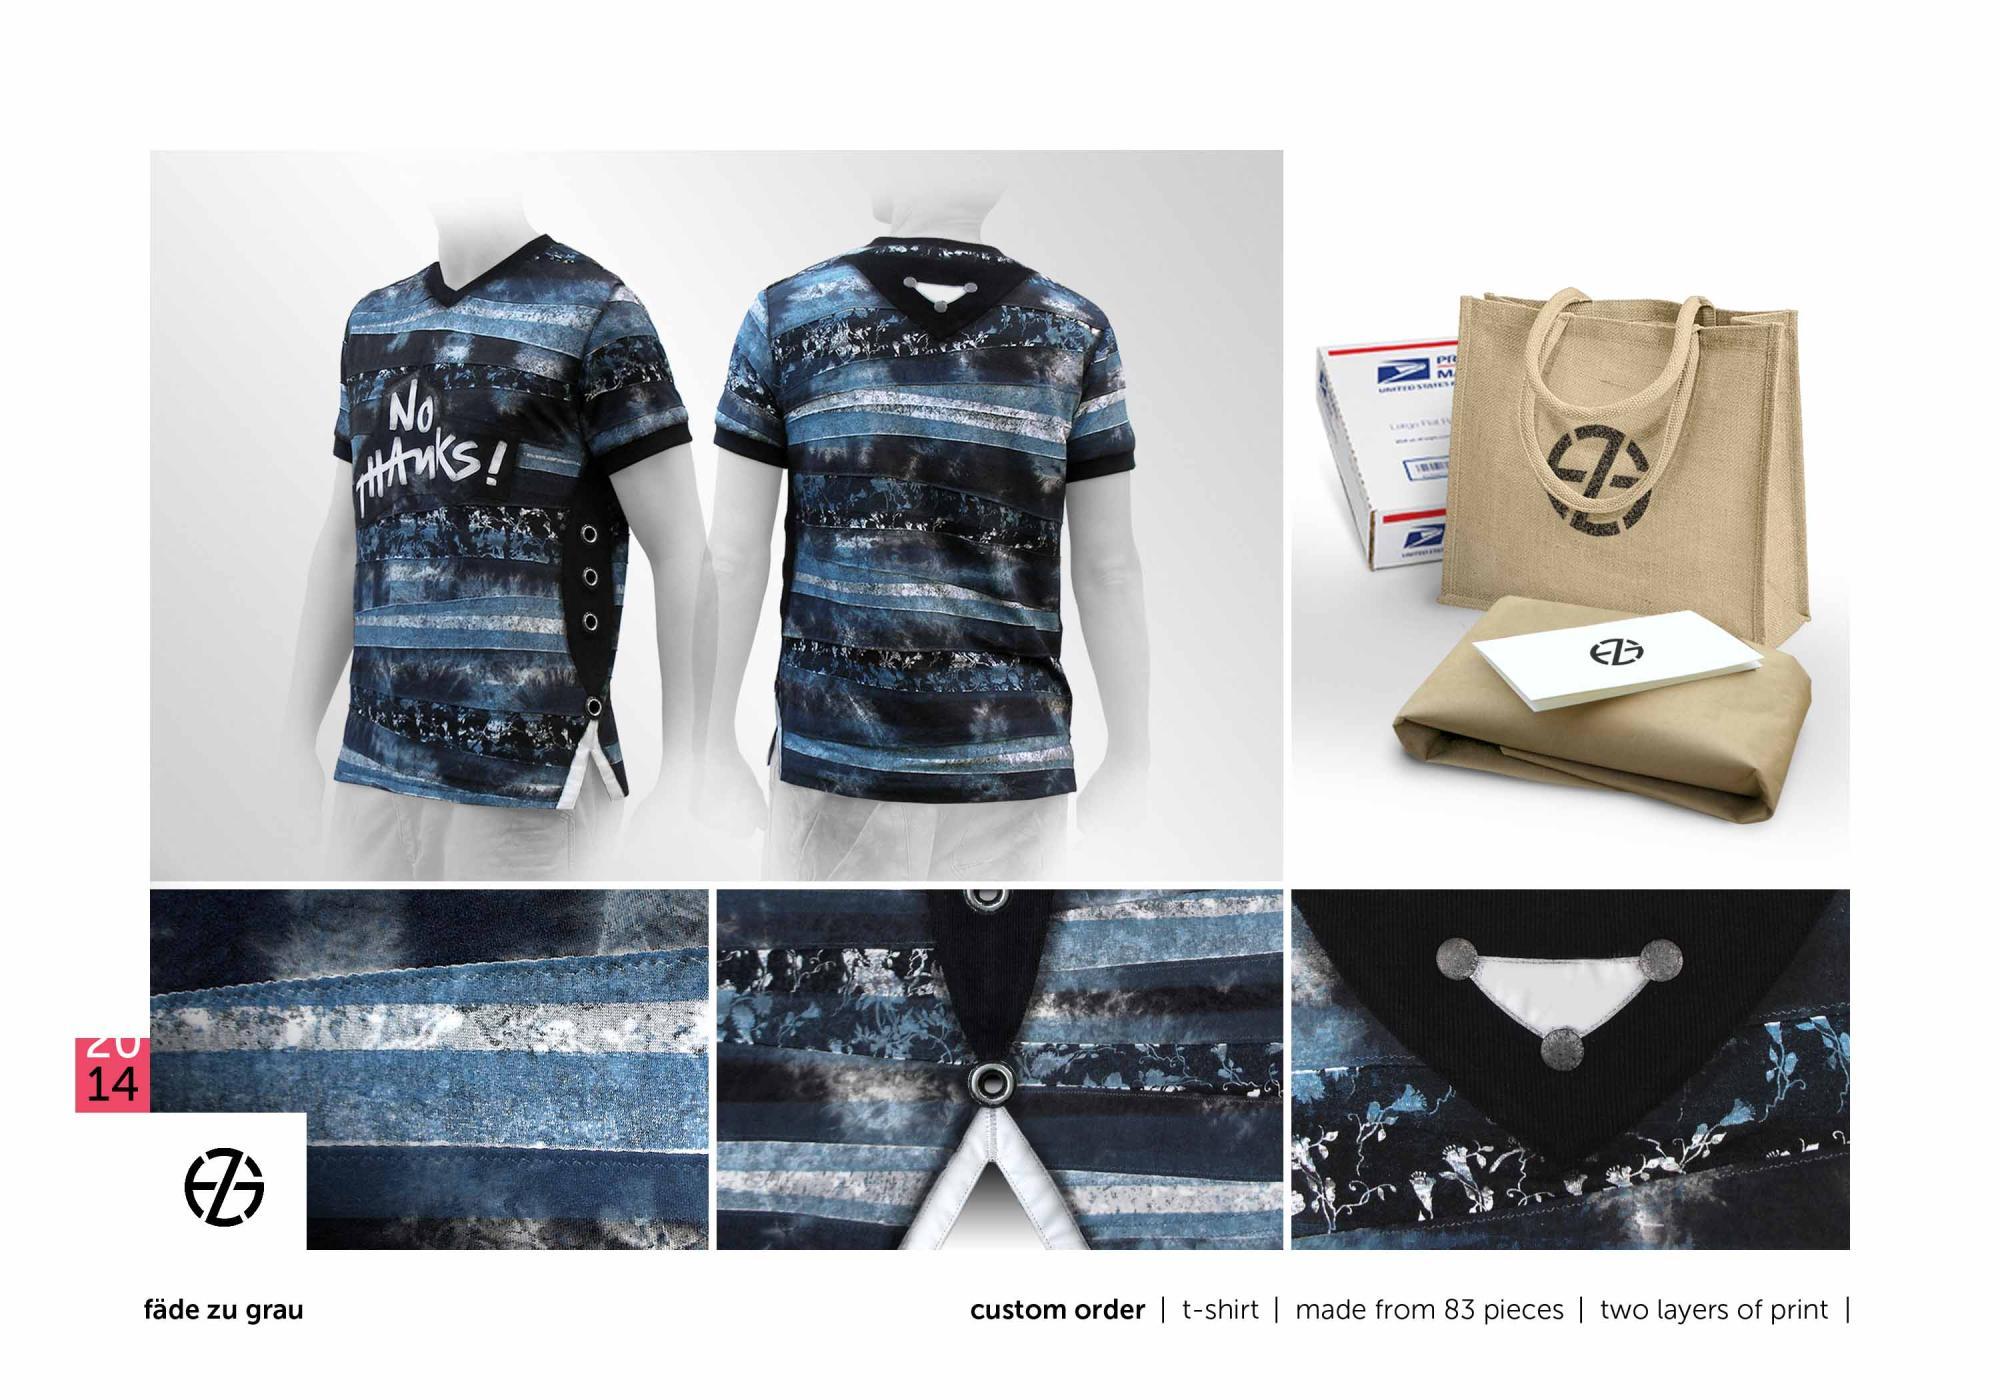 "fäde zu grau | custom order | t-shirt ""no thanks!"""